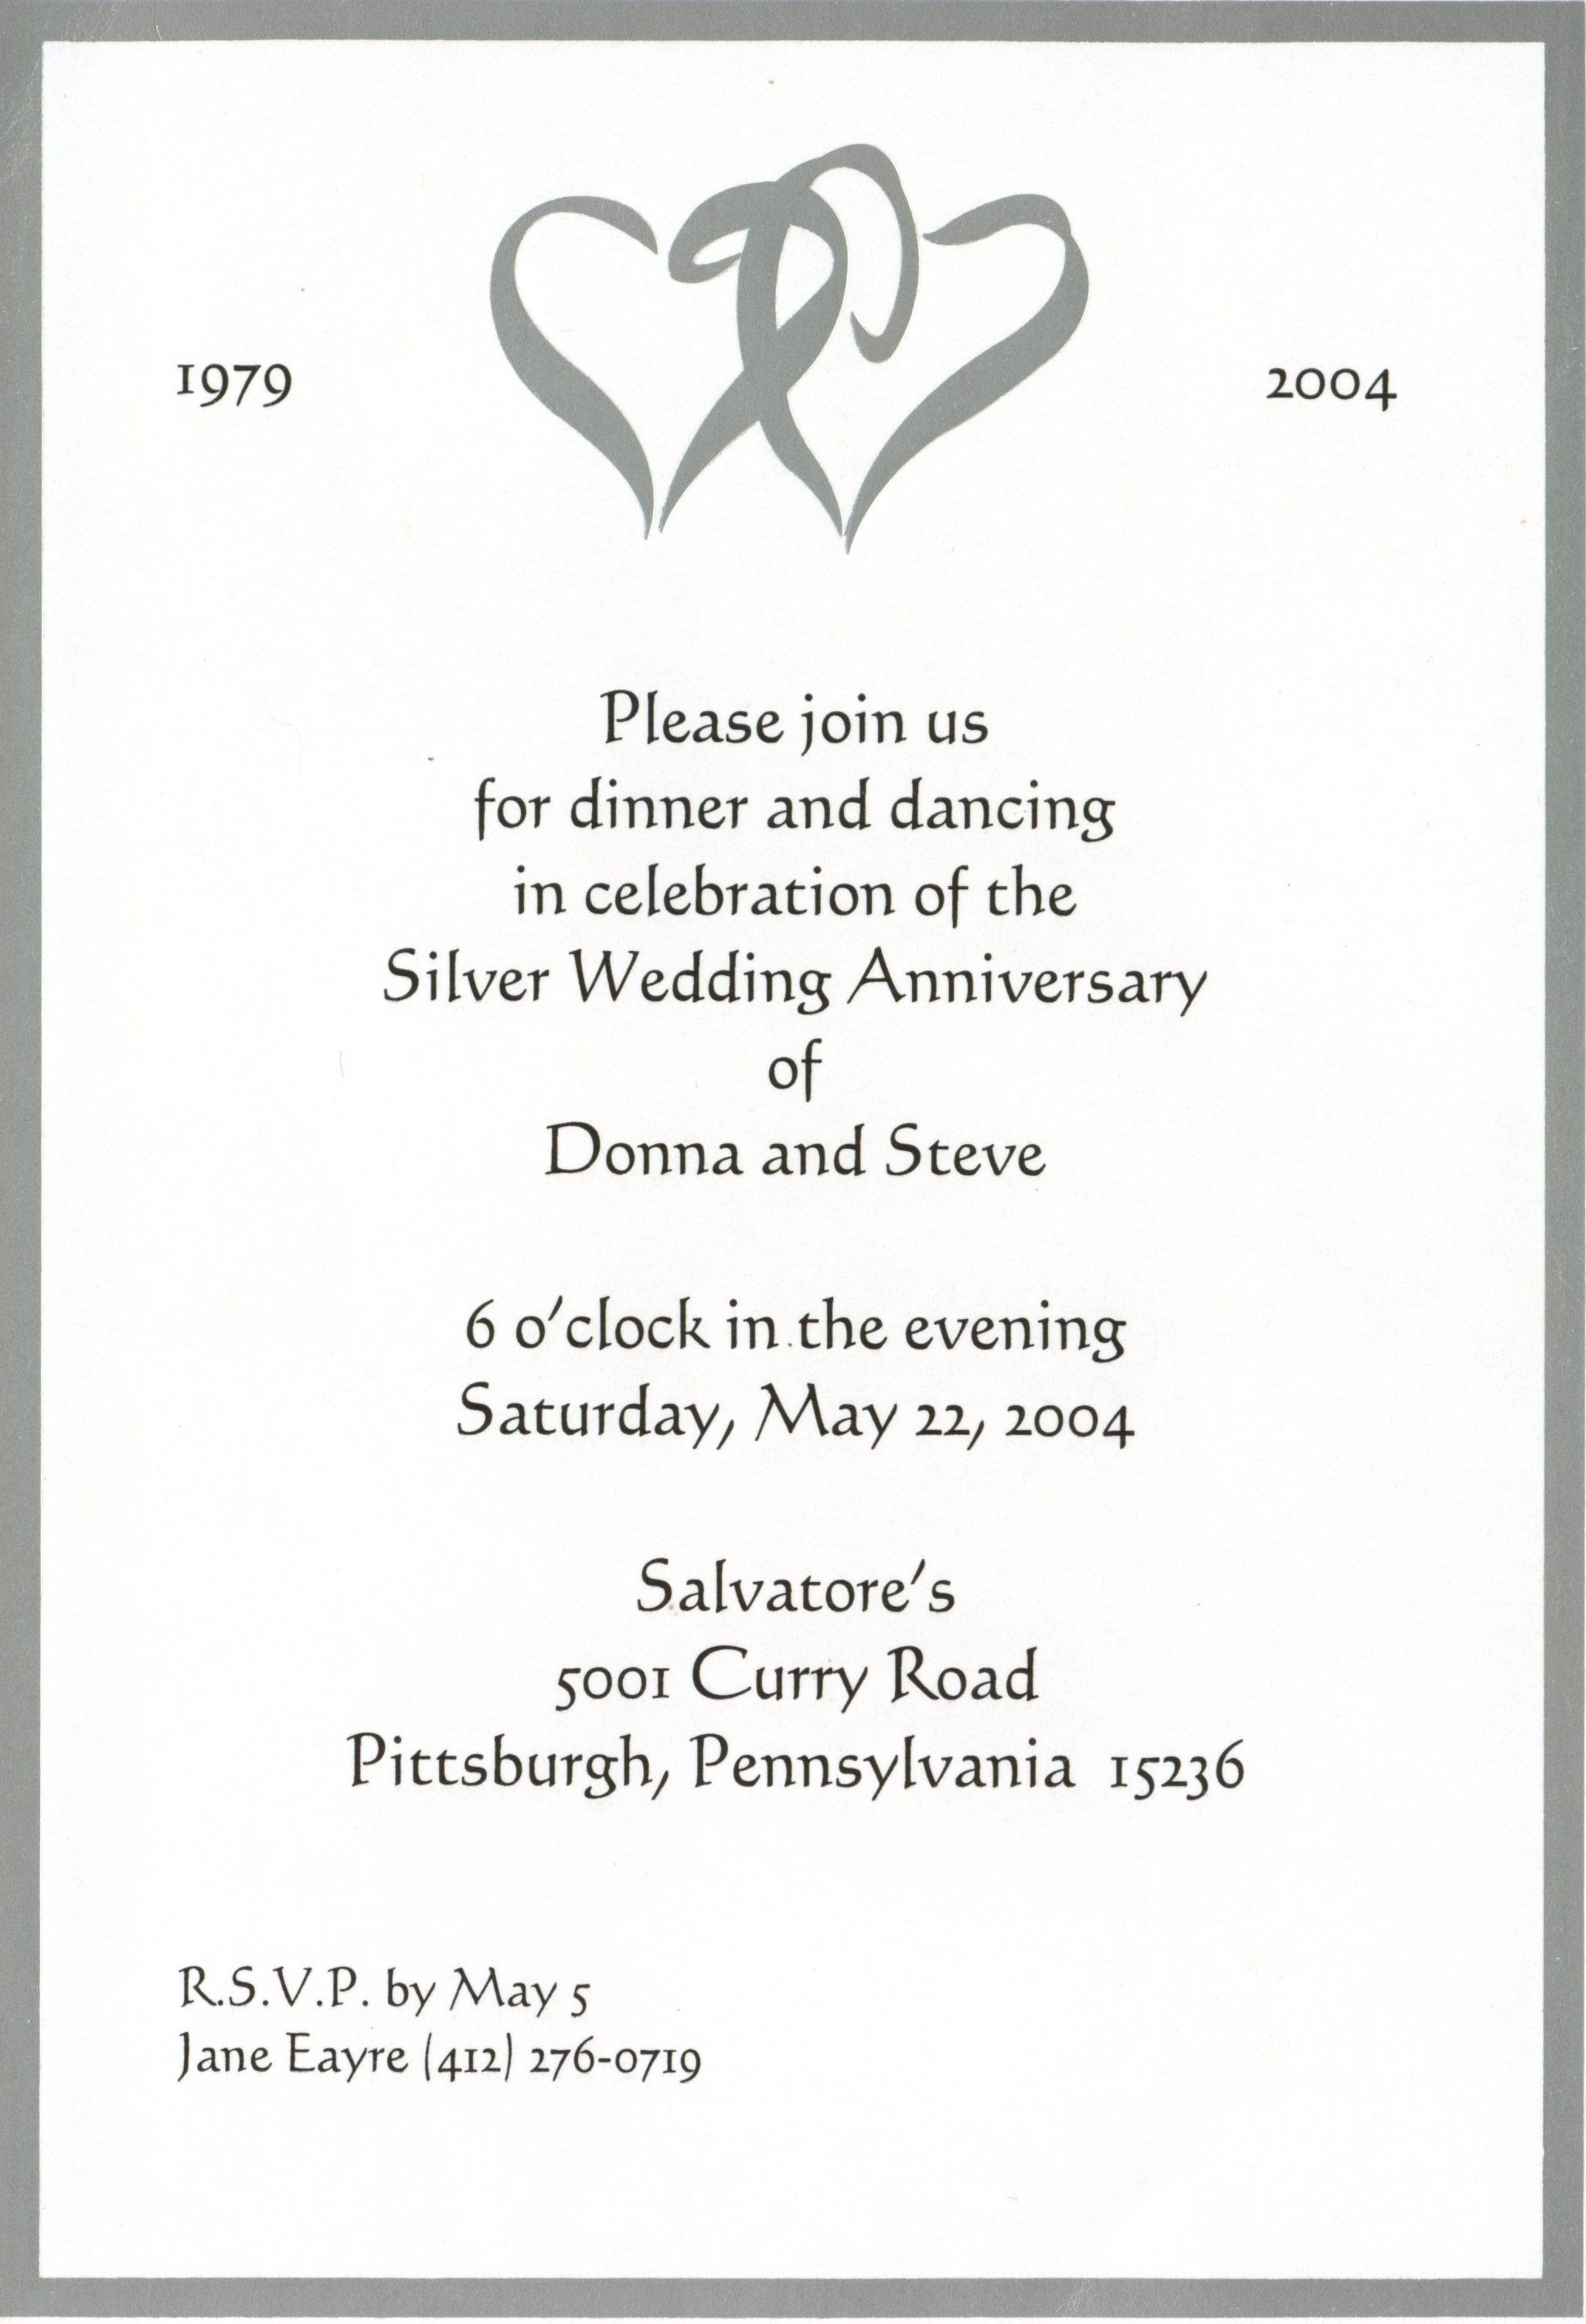 spanish wedding invitation wording  Marina Gallery Fine art